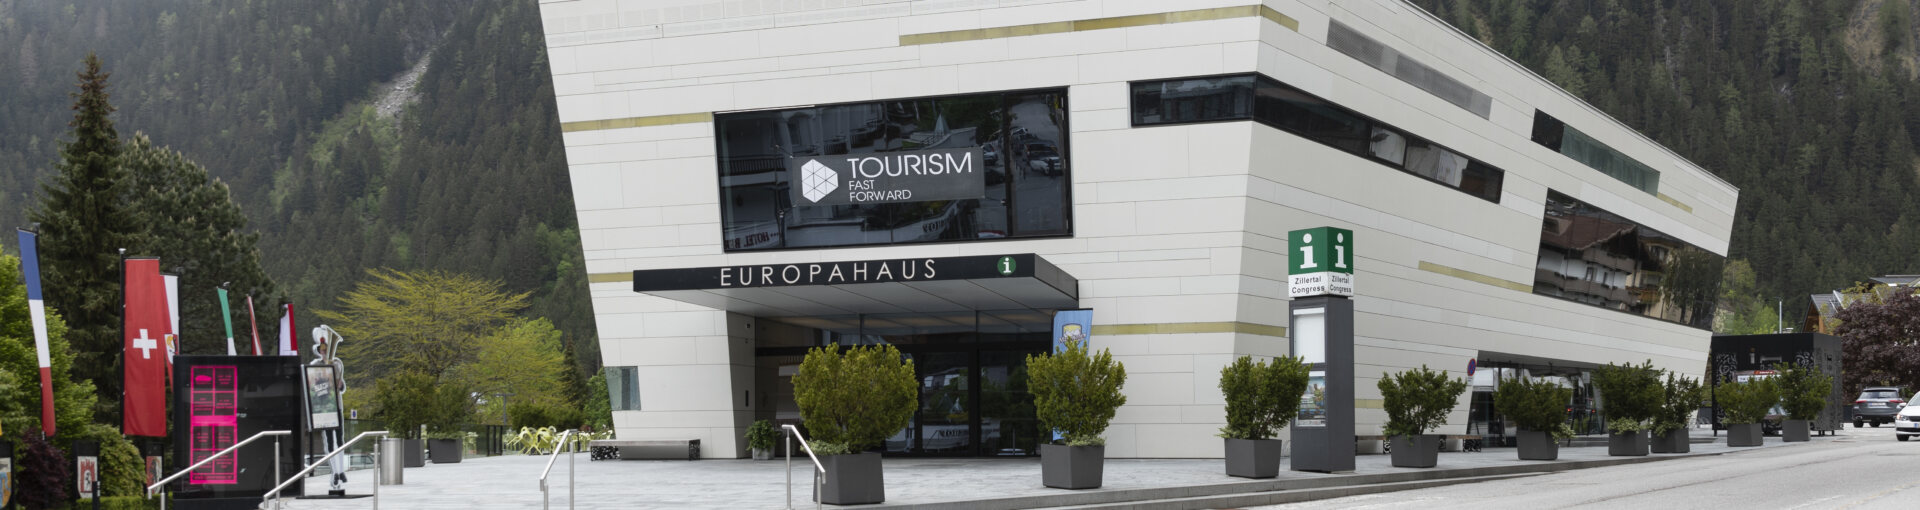 TFF Congress Zillertal - Europahaus Mayrhofen © W9 Studios